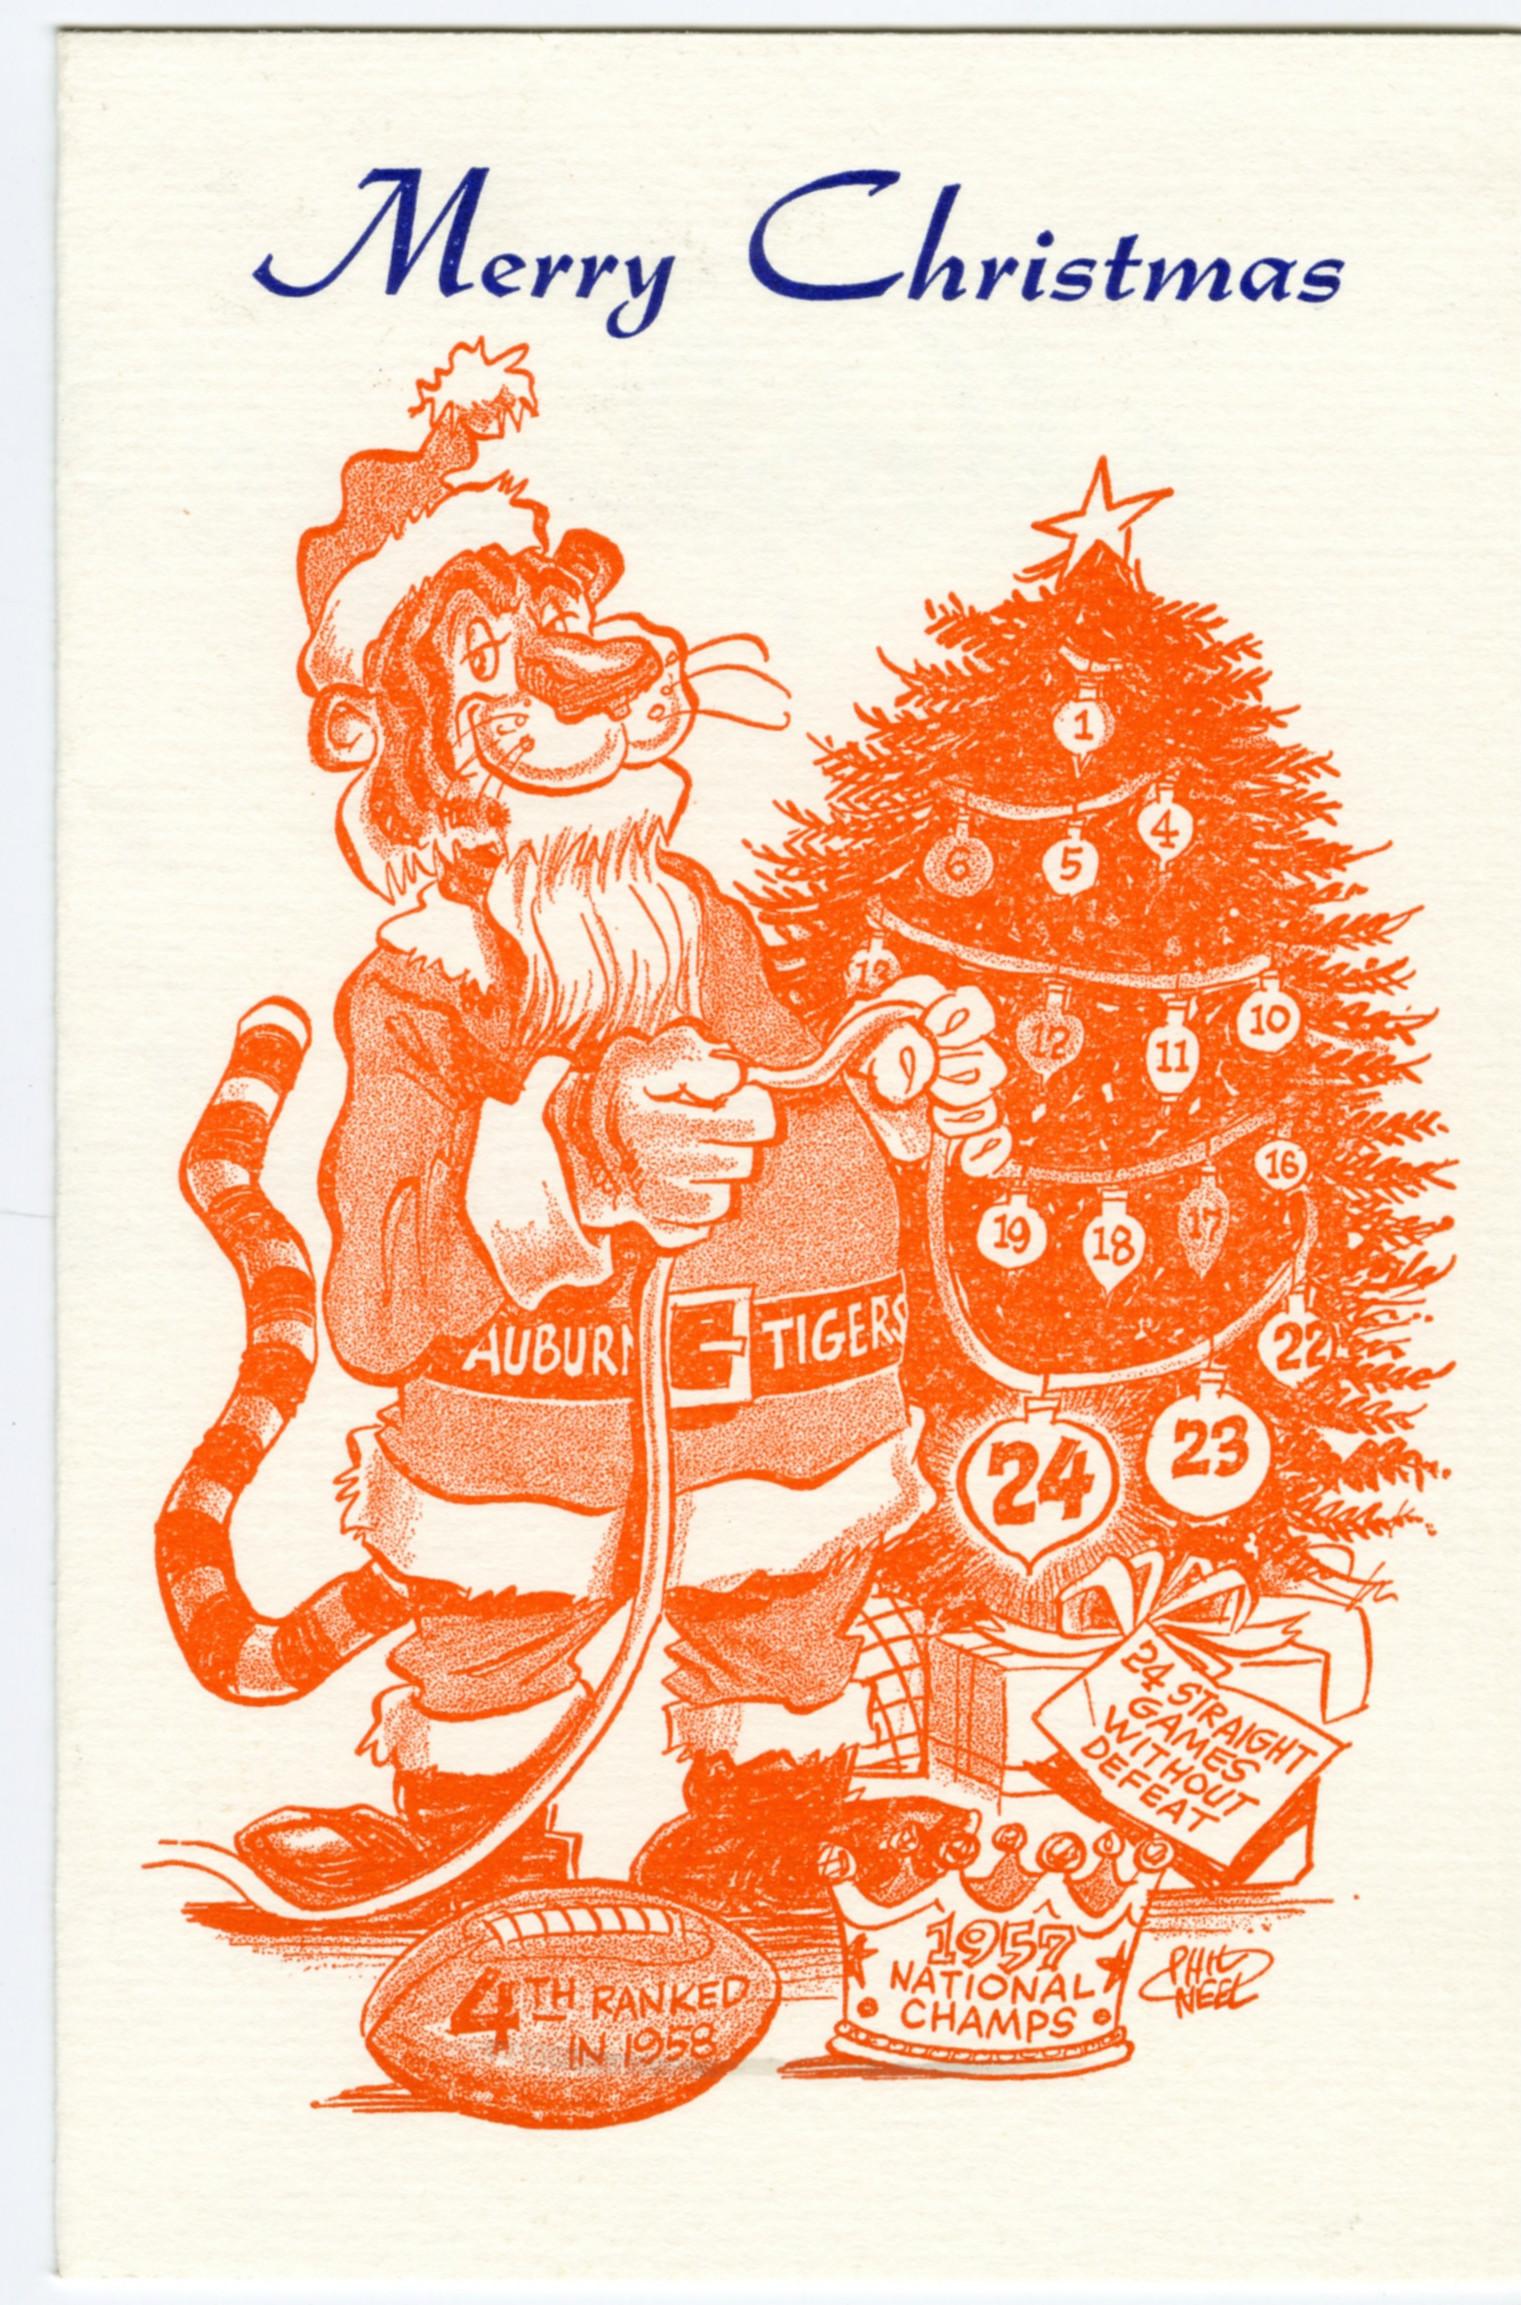 mery-christmas-1958-phil-neel-aubie-card